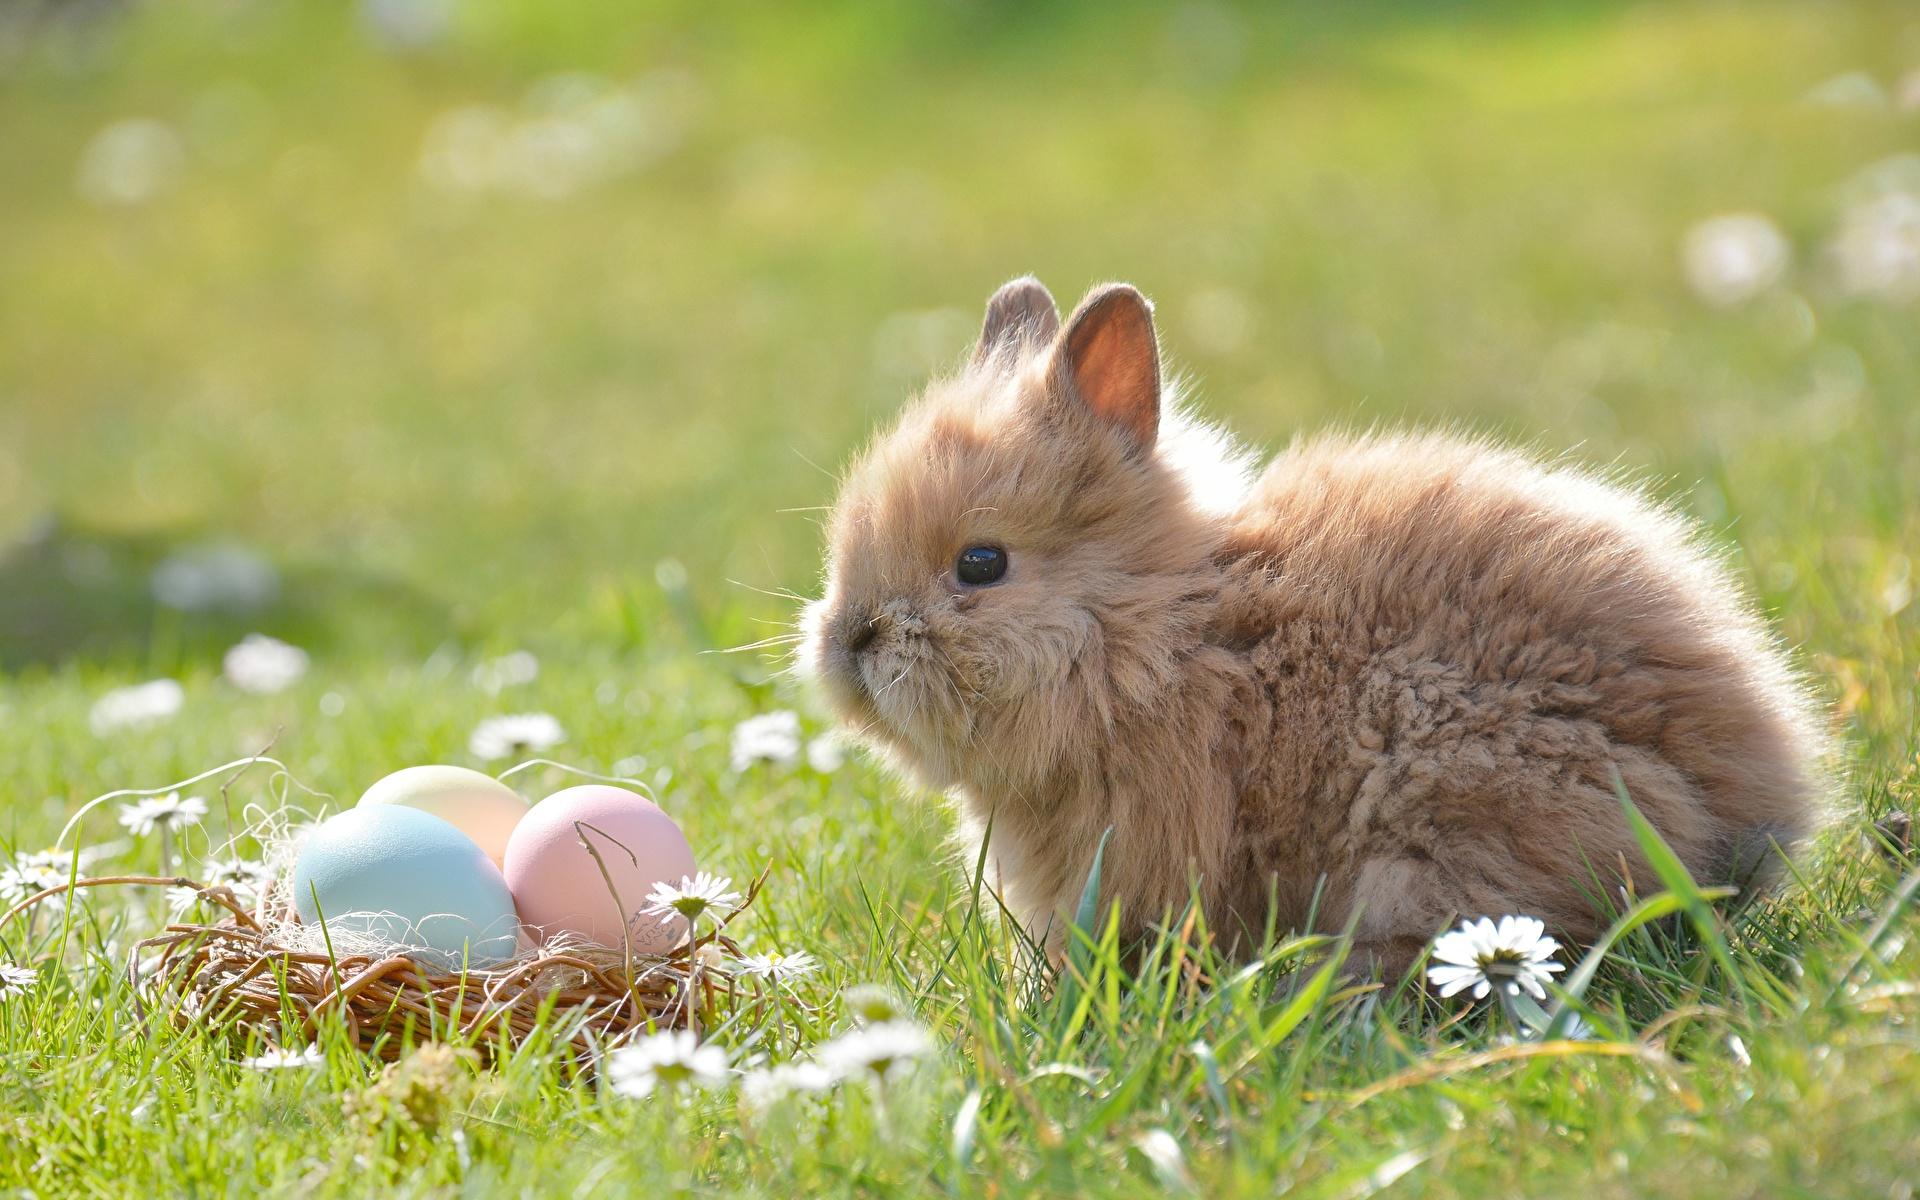 Картинка Пасха кролик яйцами траве Животные 1920x1200 Кролики яиц яйцо Яйца Трава животное